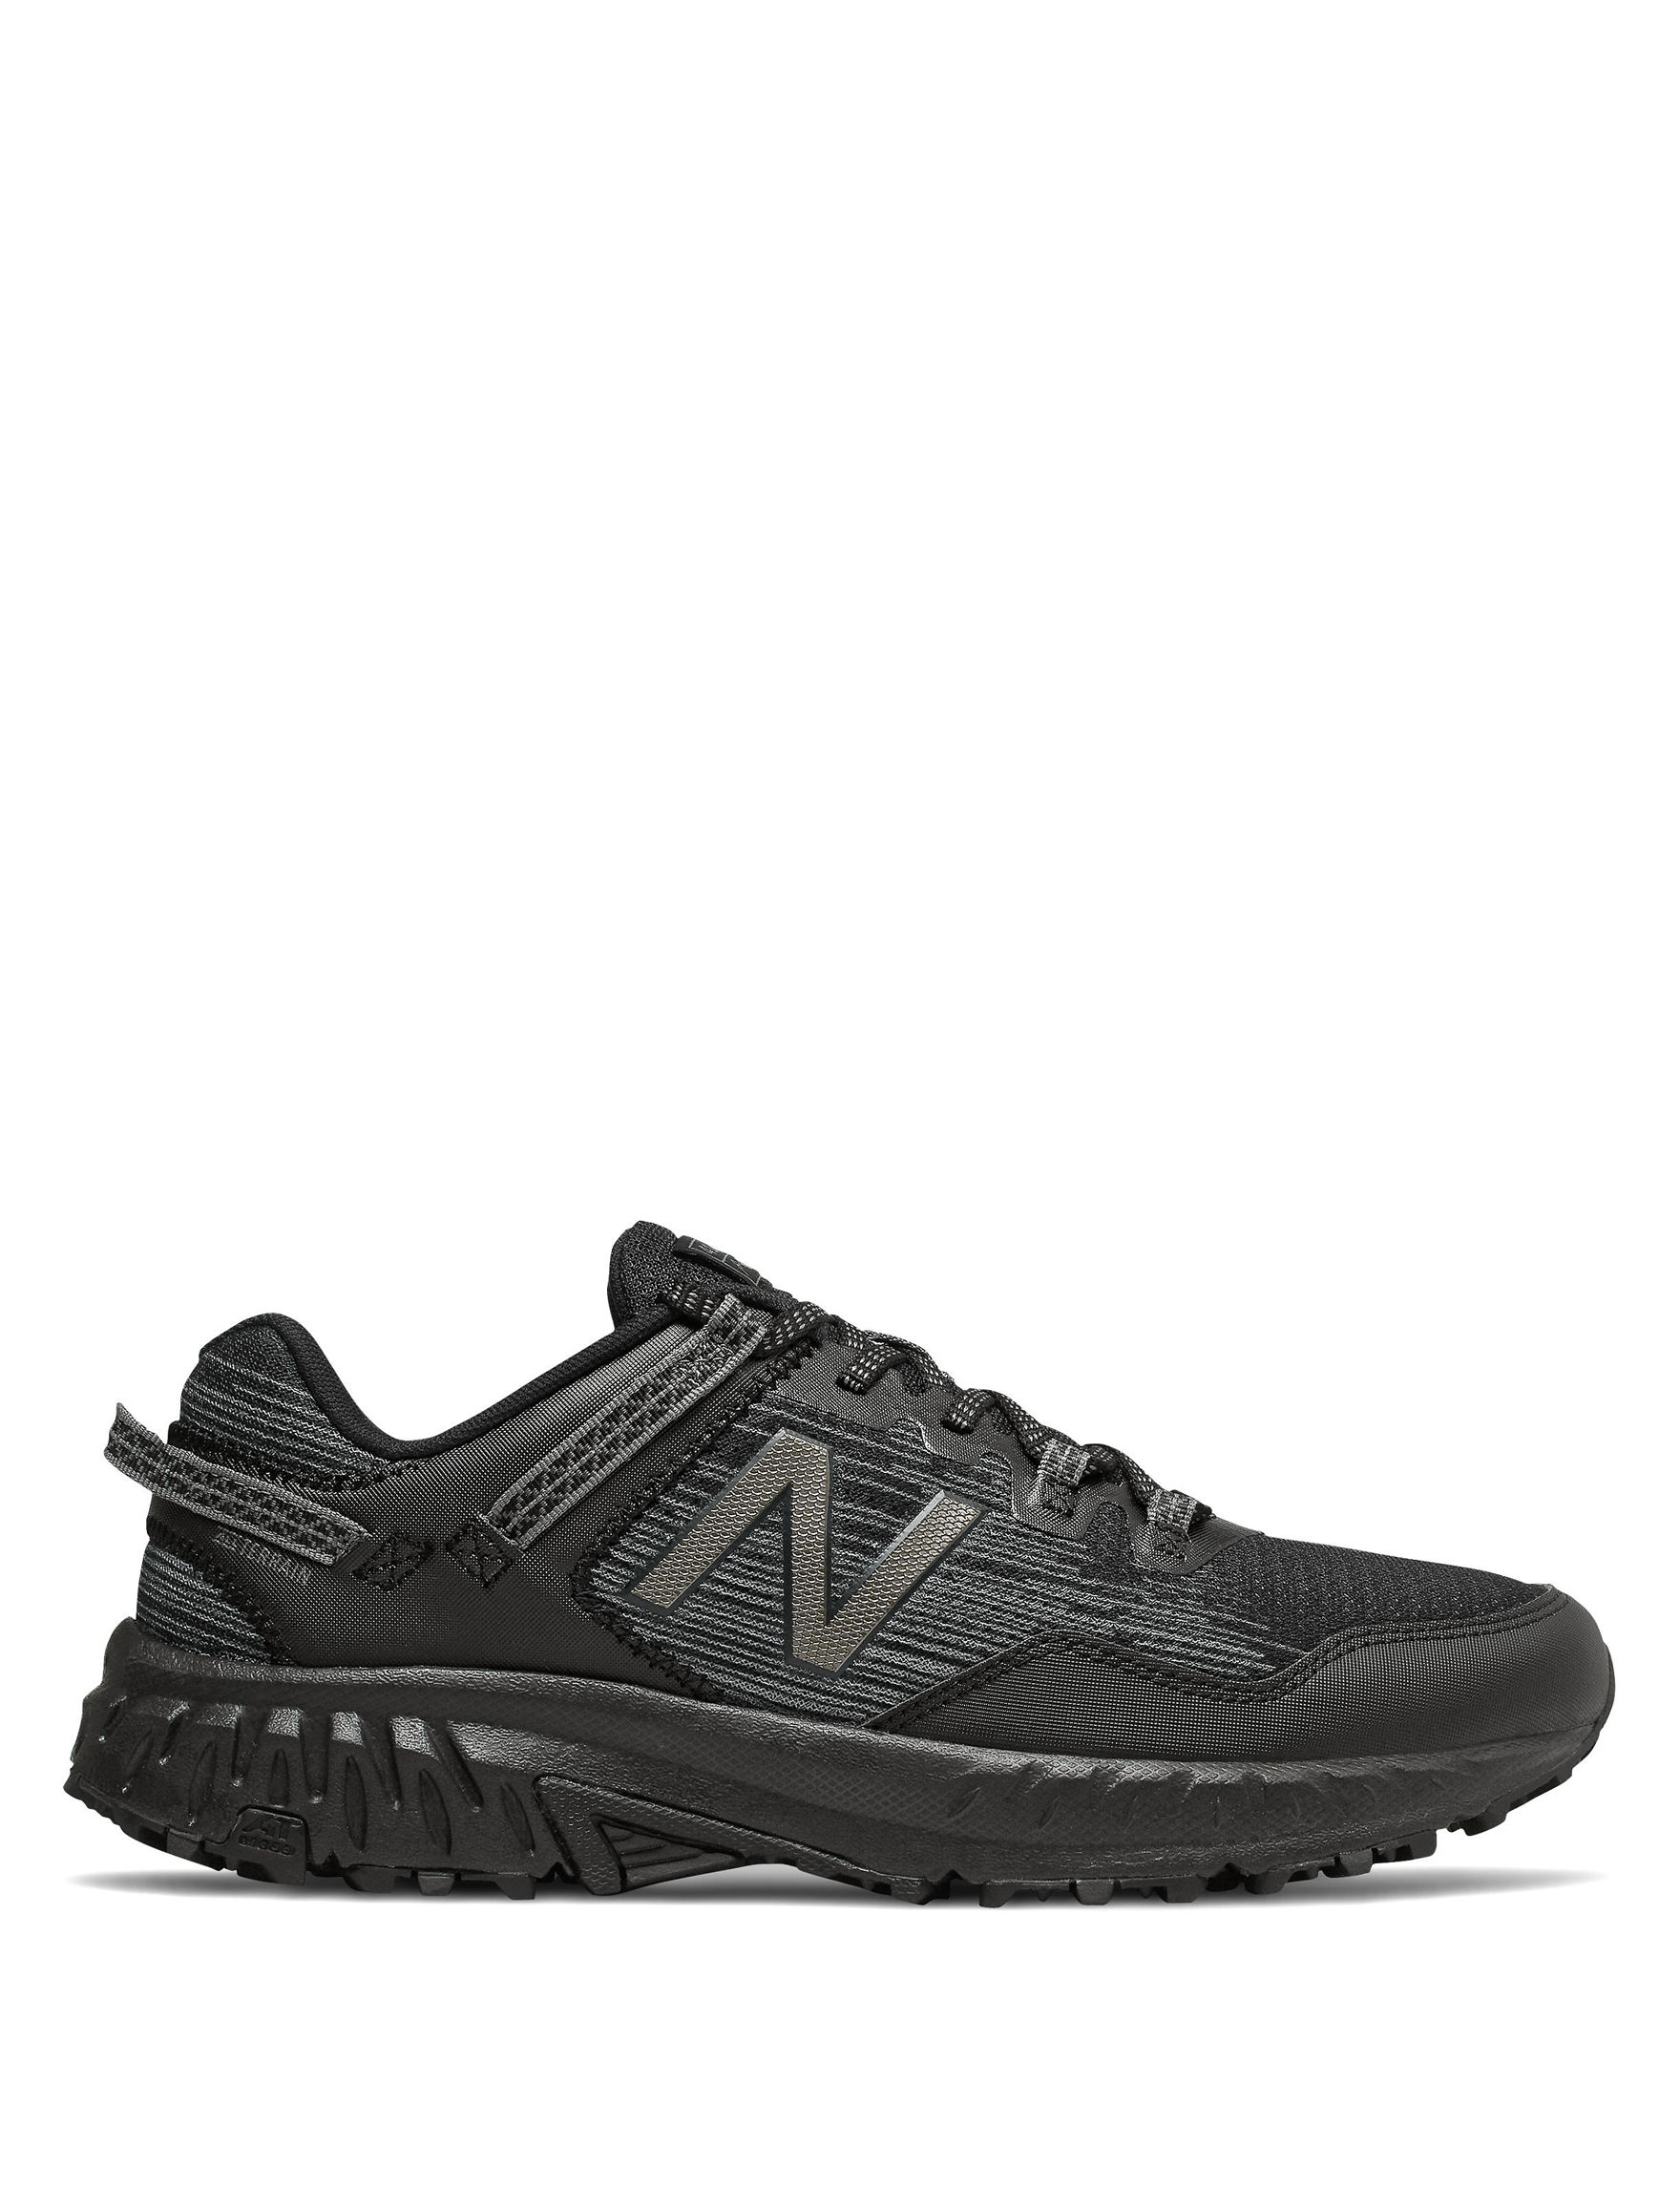 New Balance Black / Grey